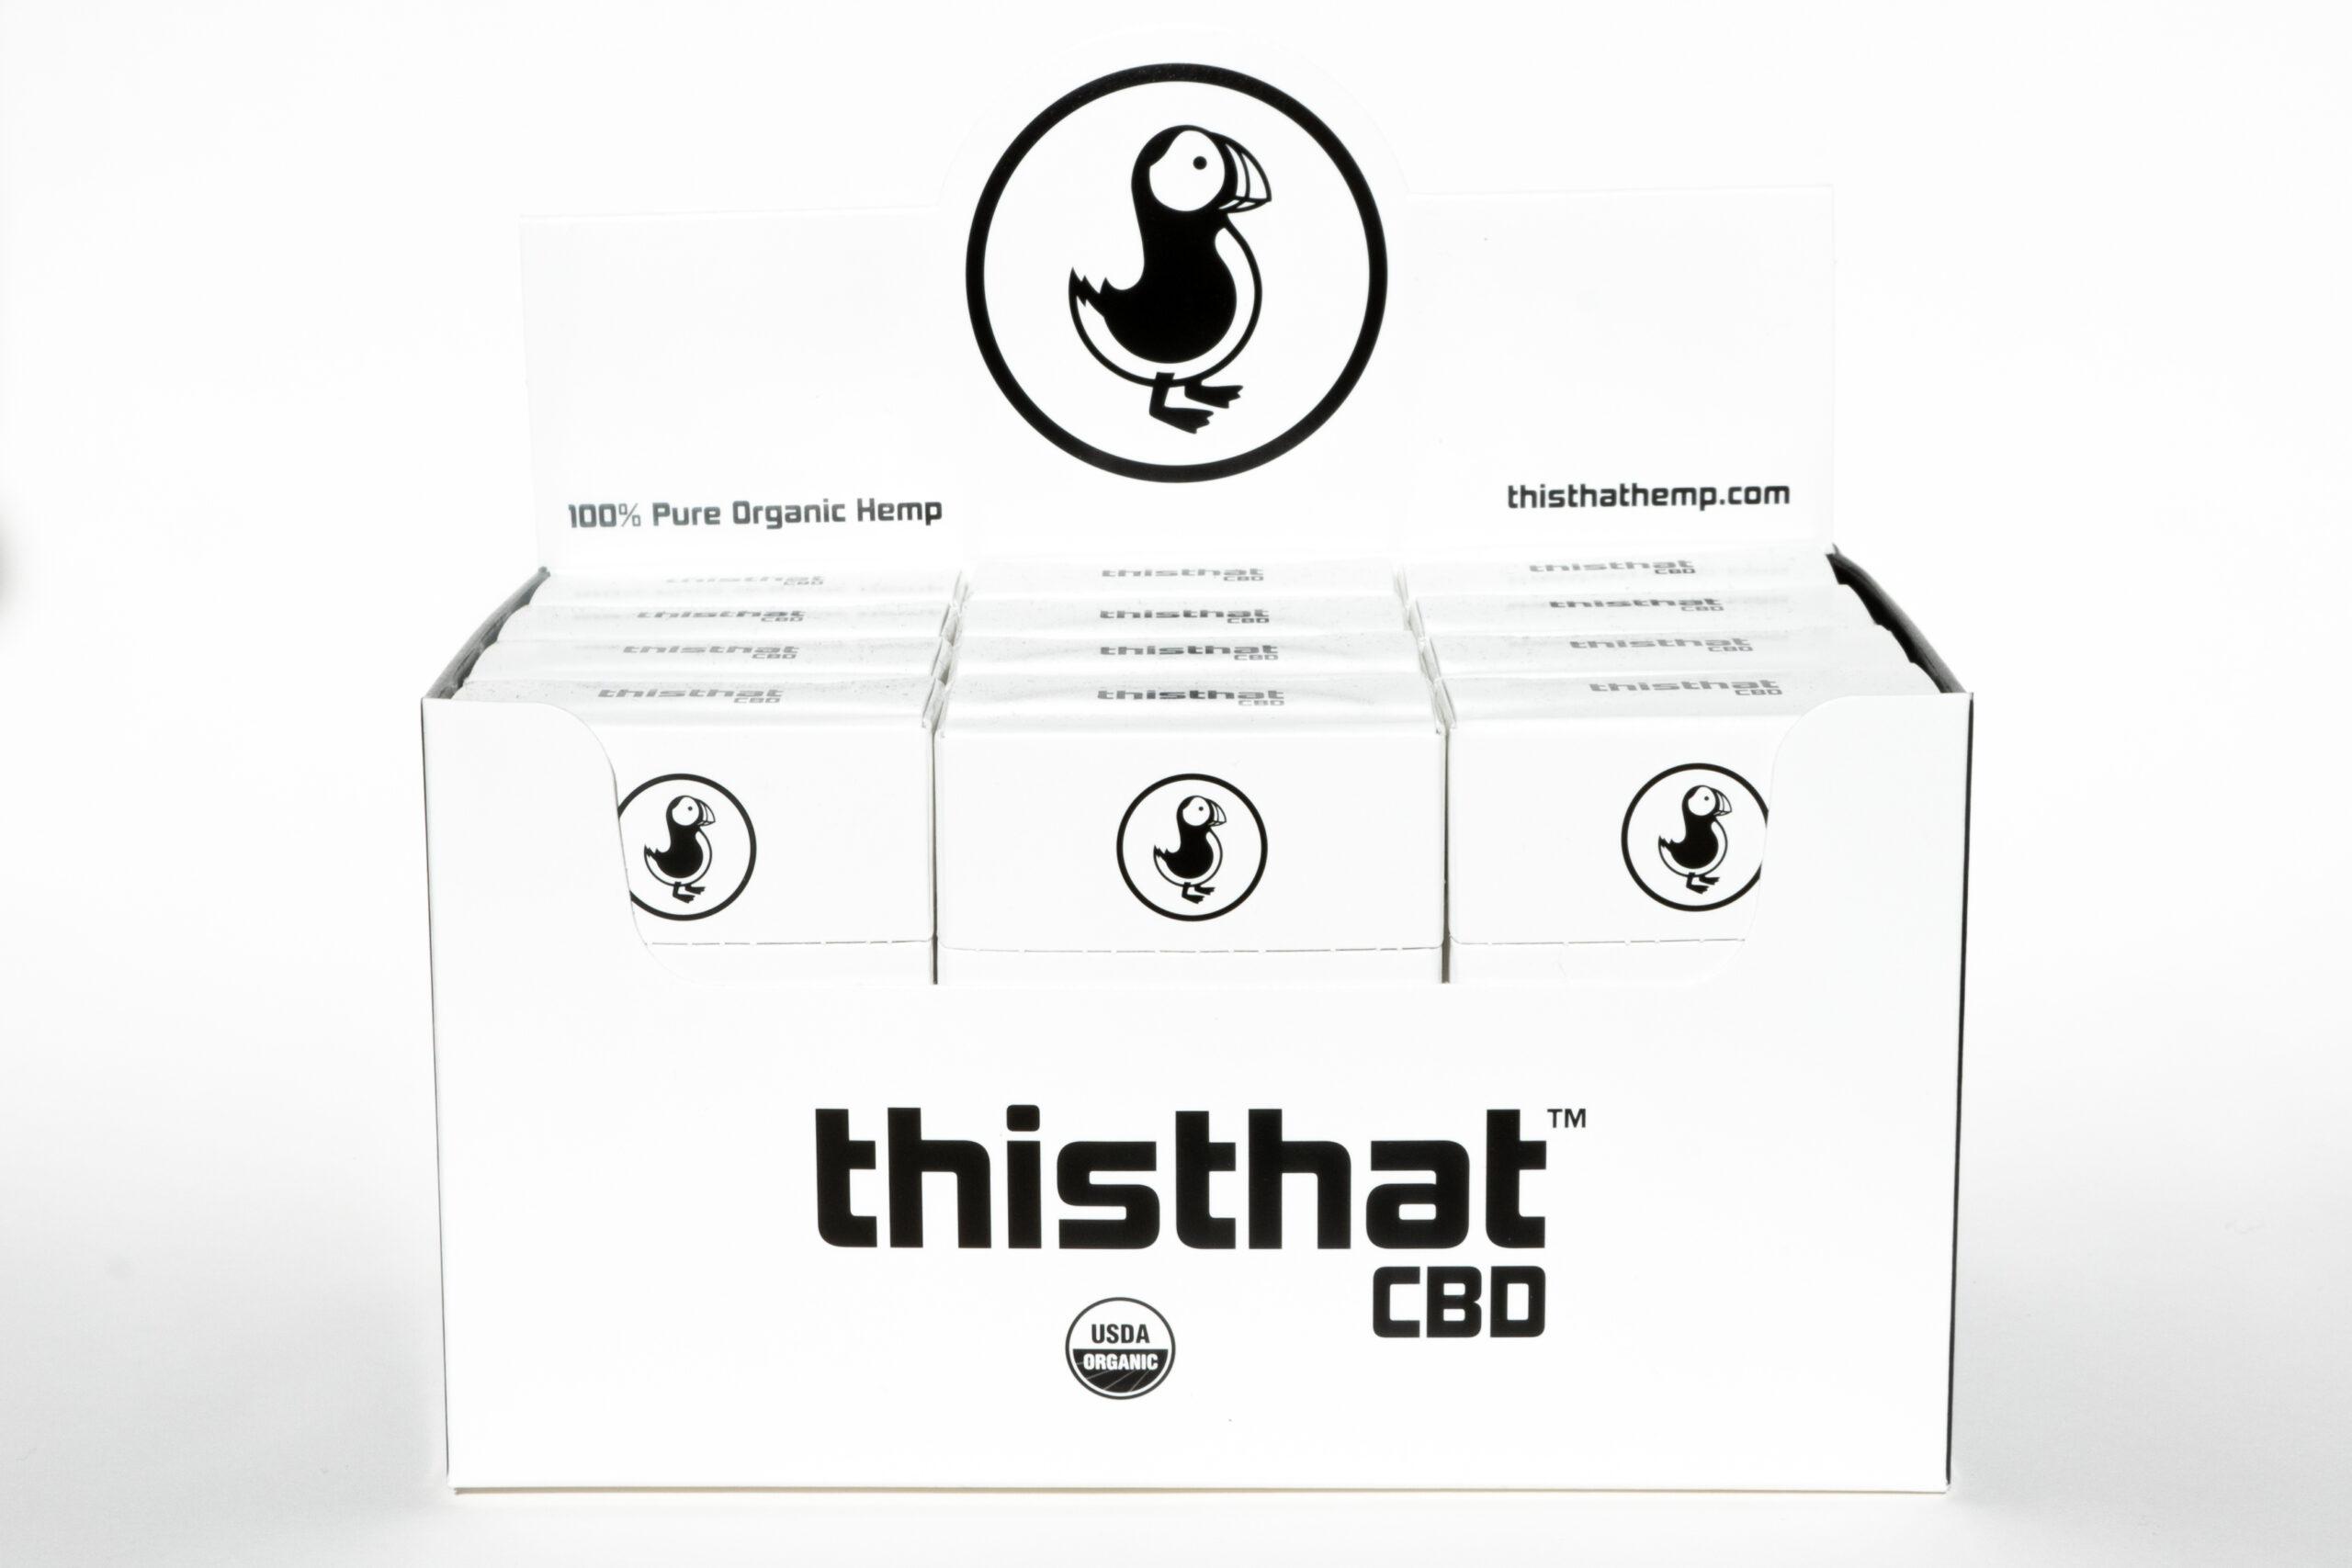 thisthatCBD Master 12 Pack hemp CBD cigarettes